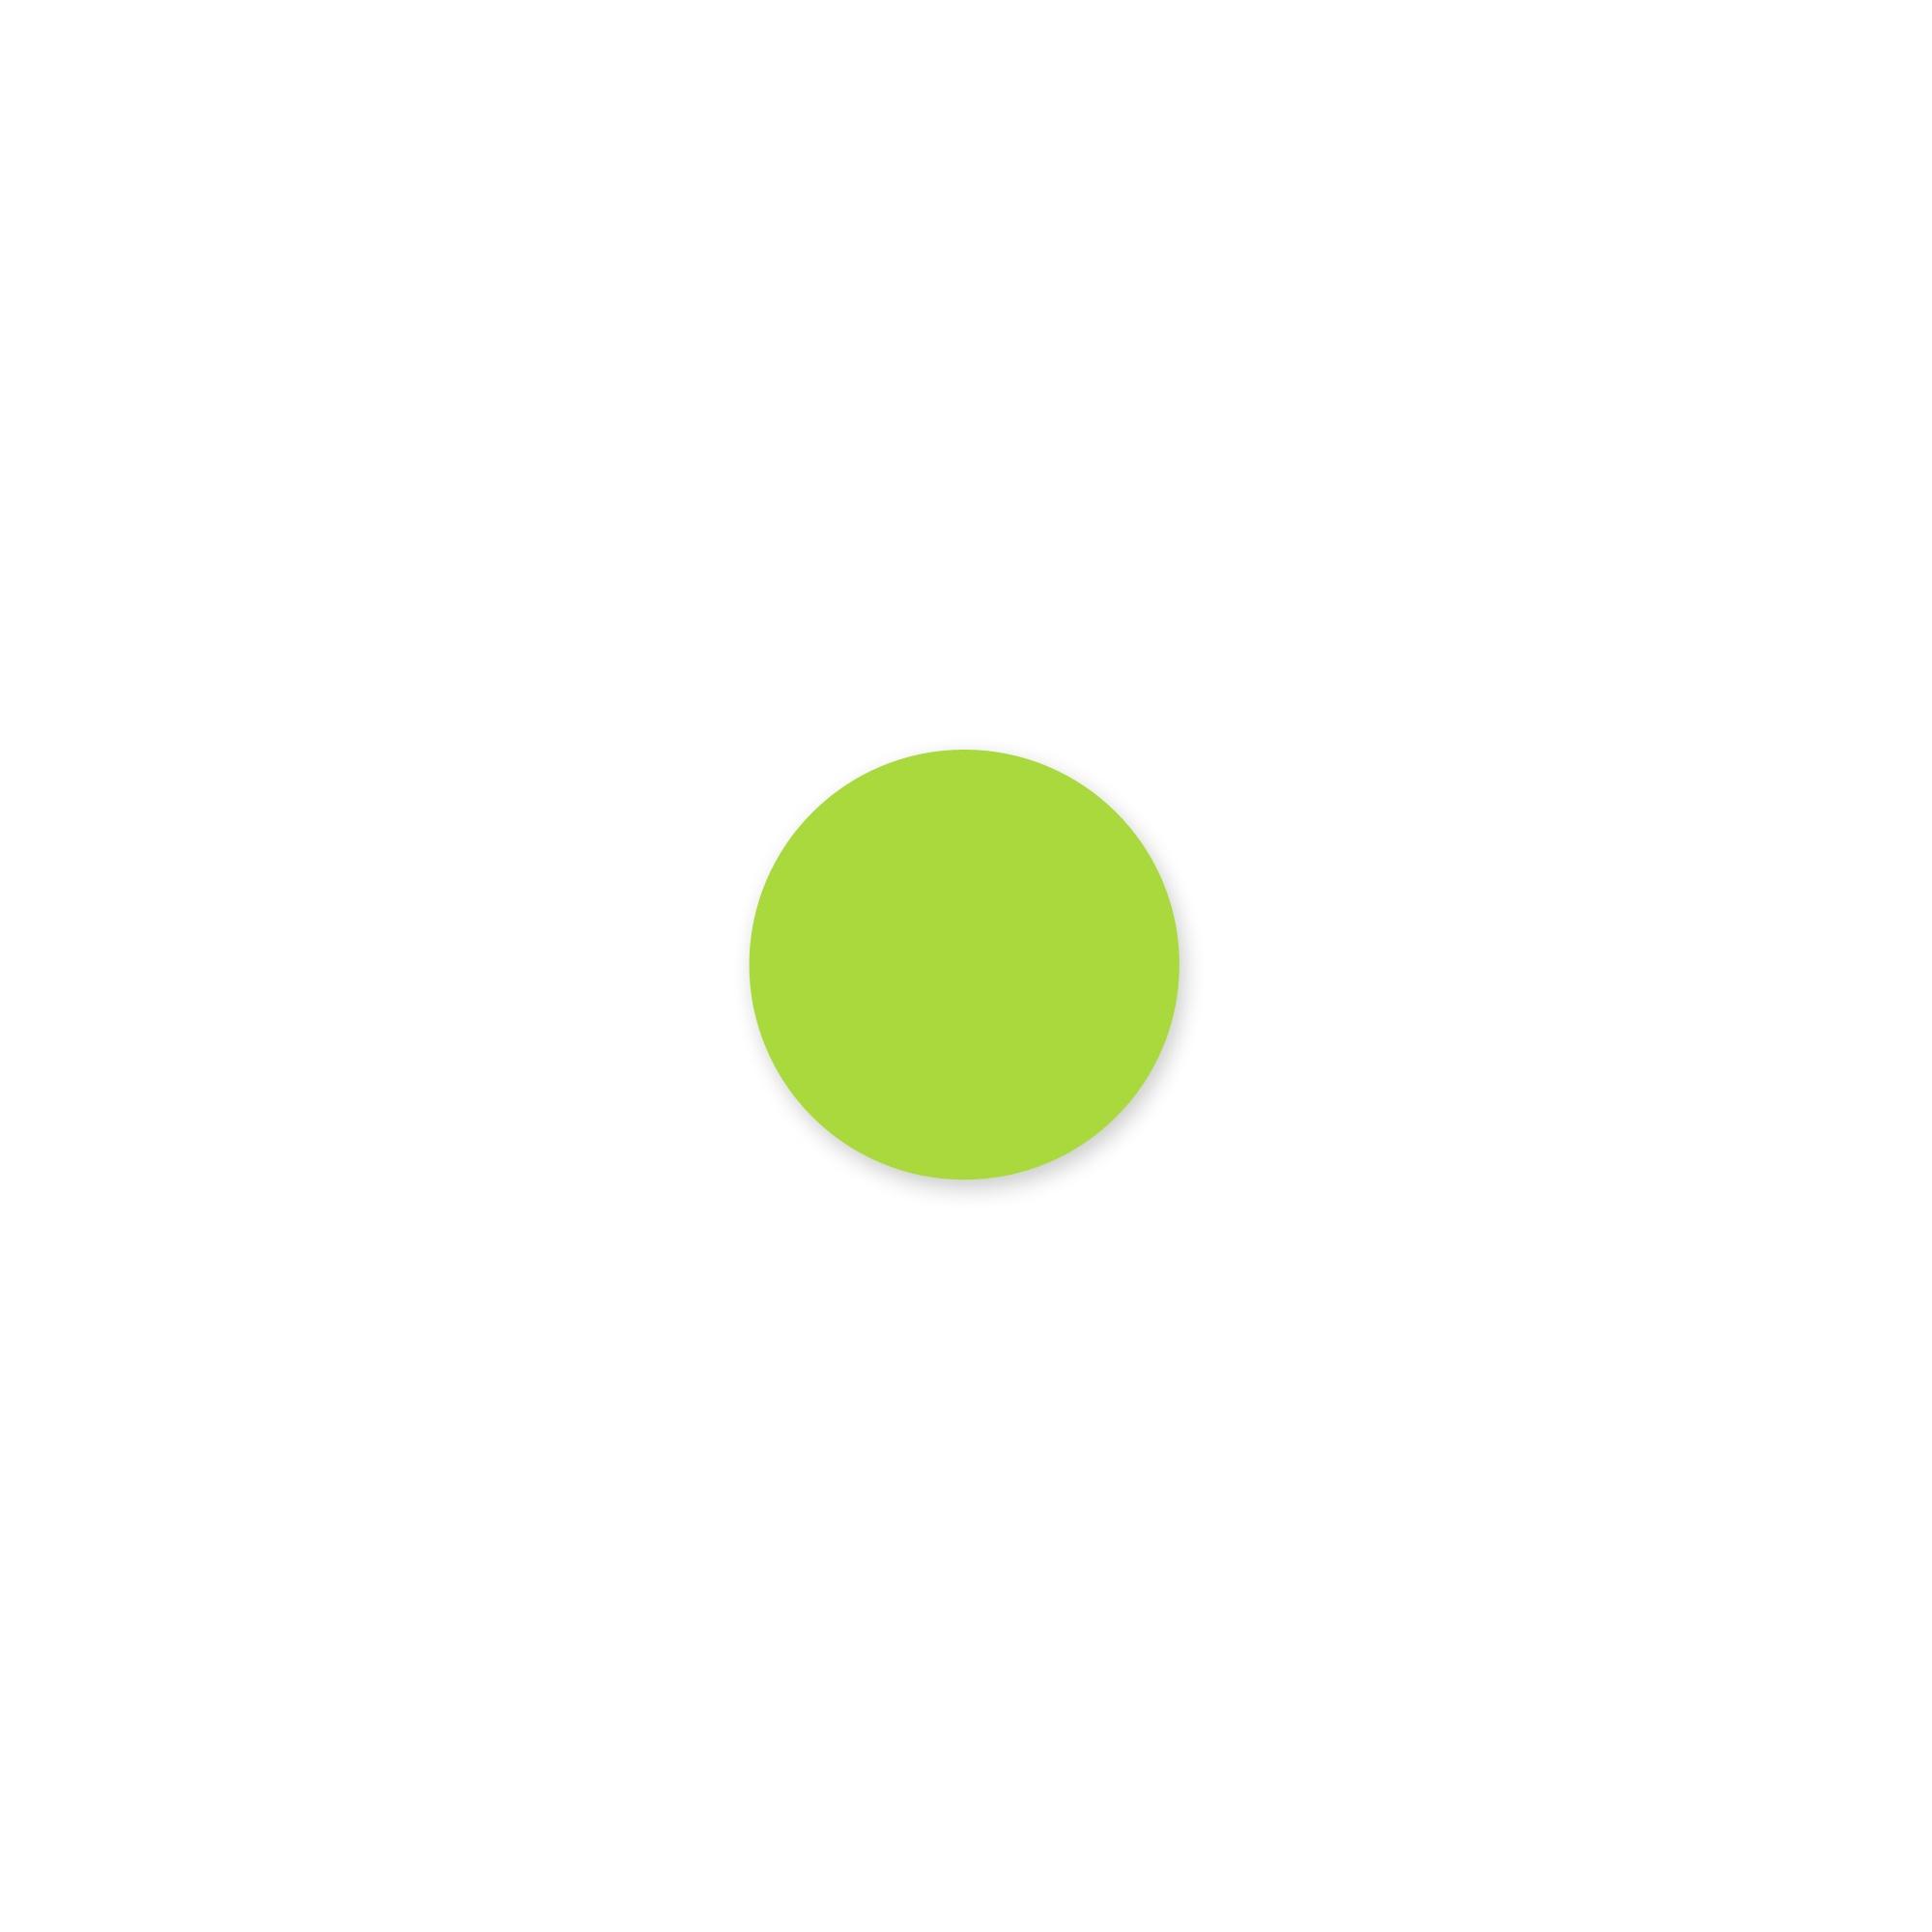 Adhesive Identification Dots Image